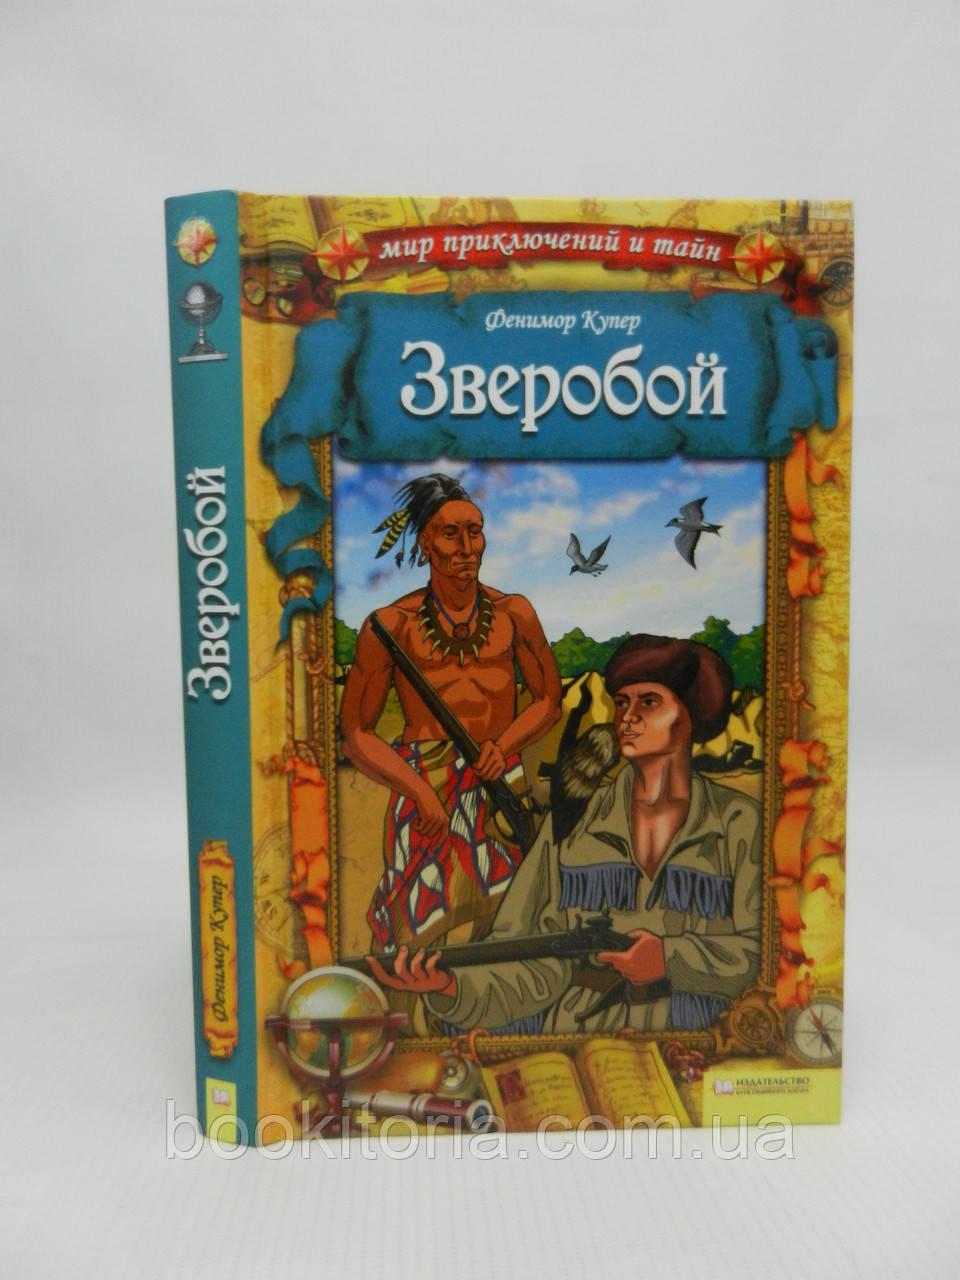 Купер Ф. Зверобой (б/у).